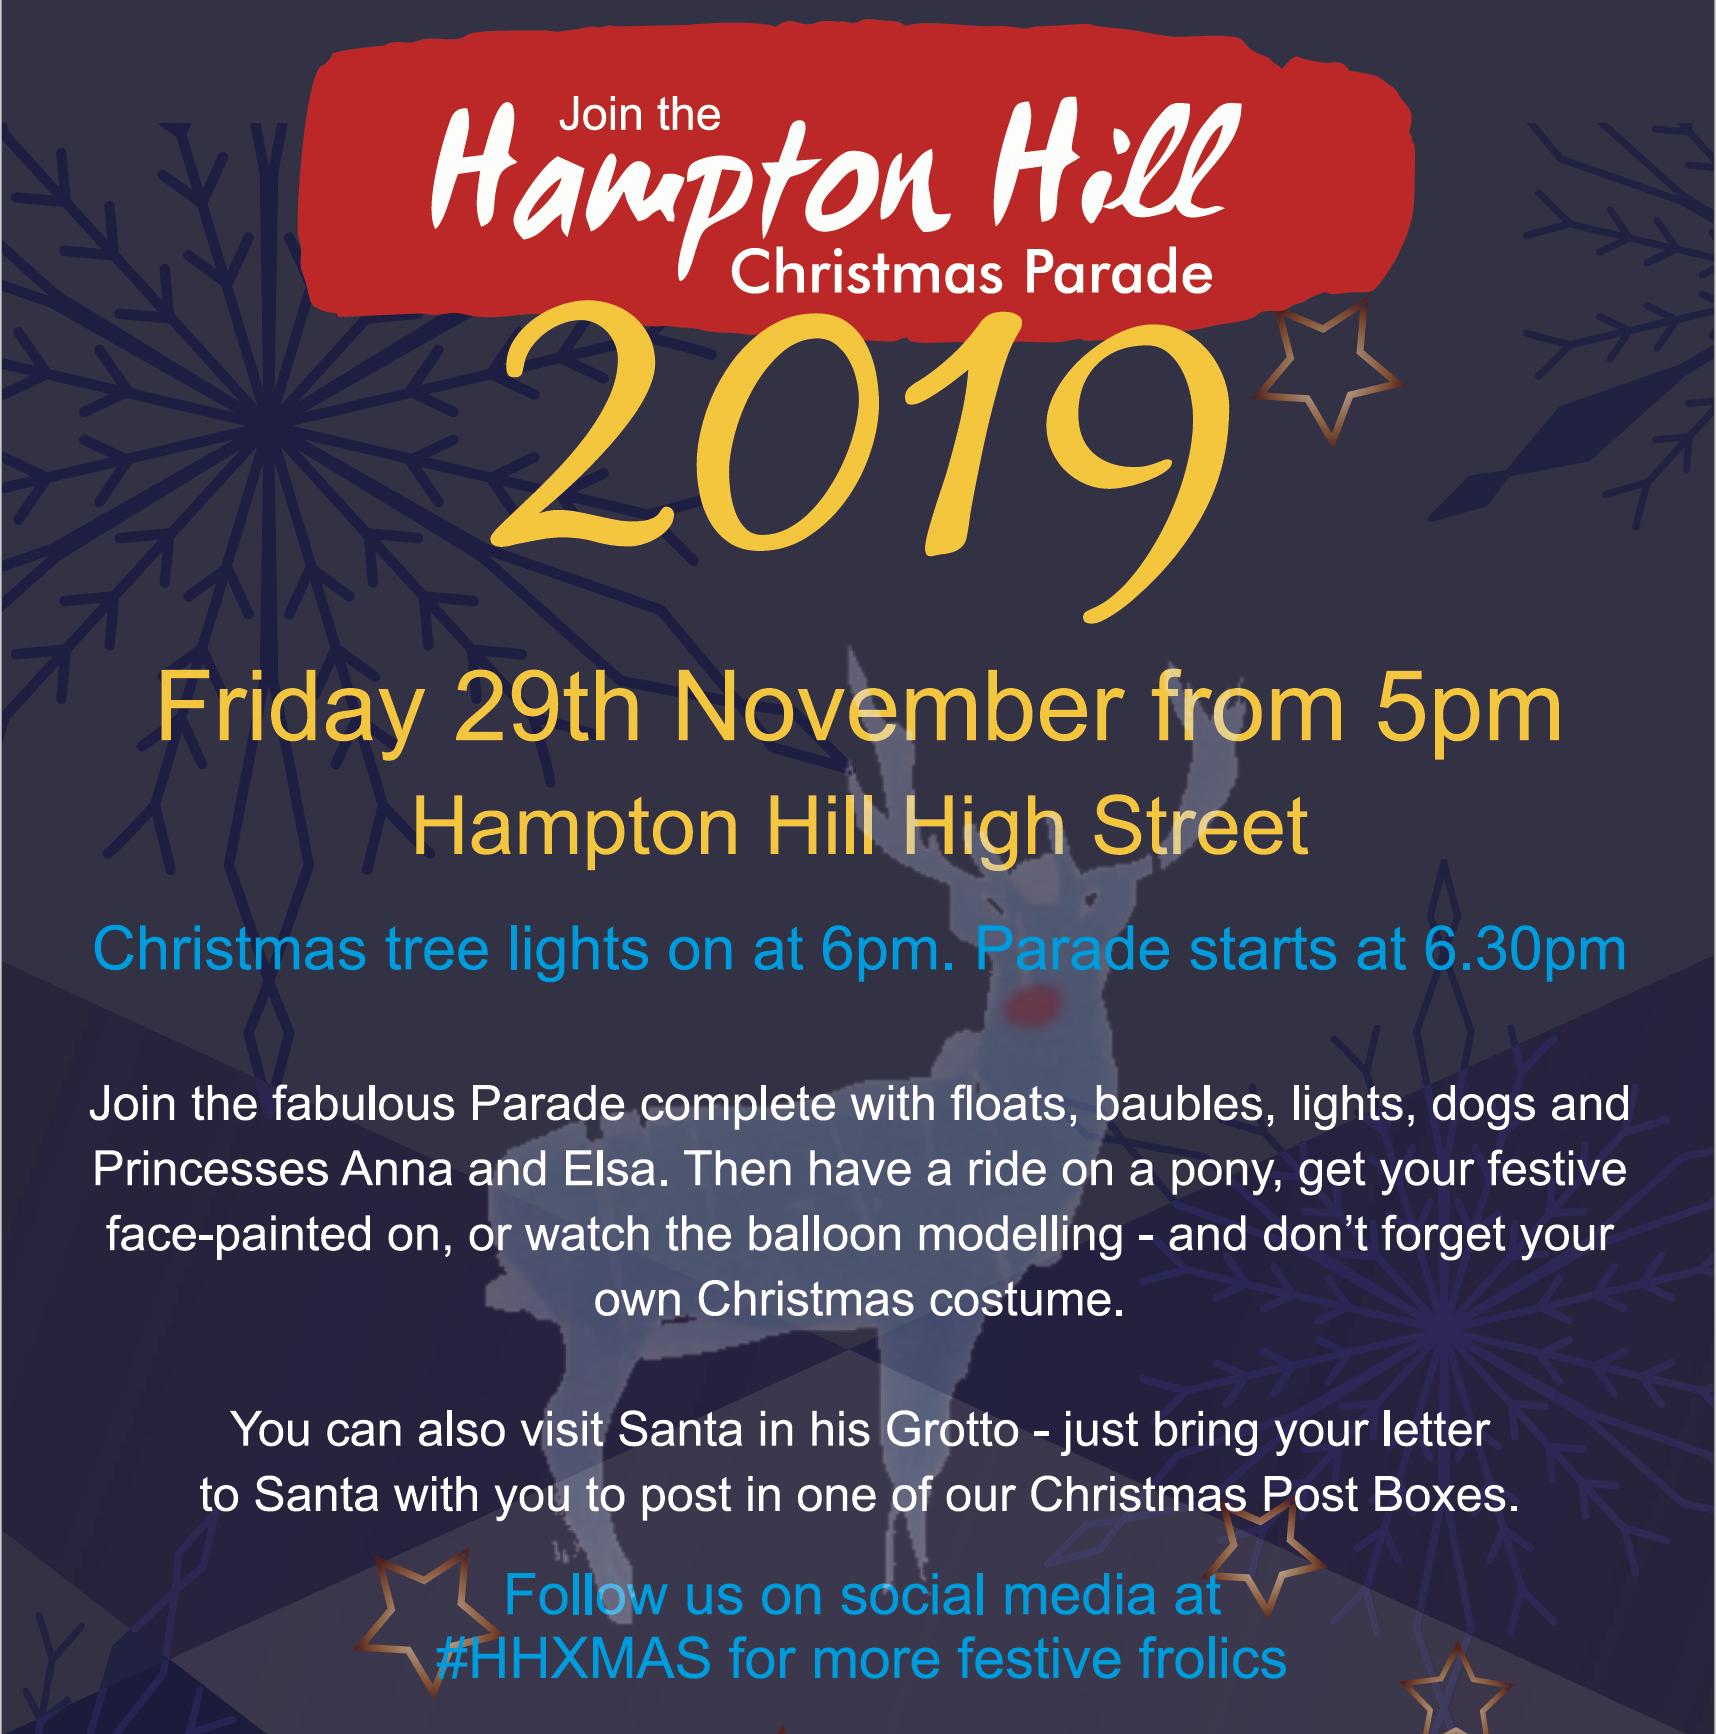 Join the Hampton Hill Christmas Parade Friday 29th November